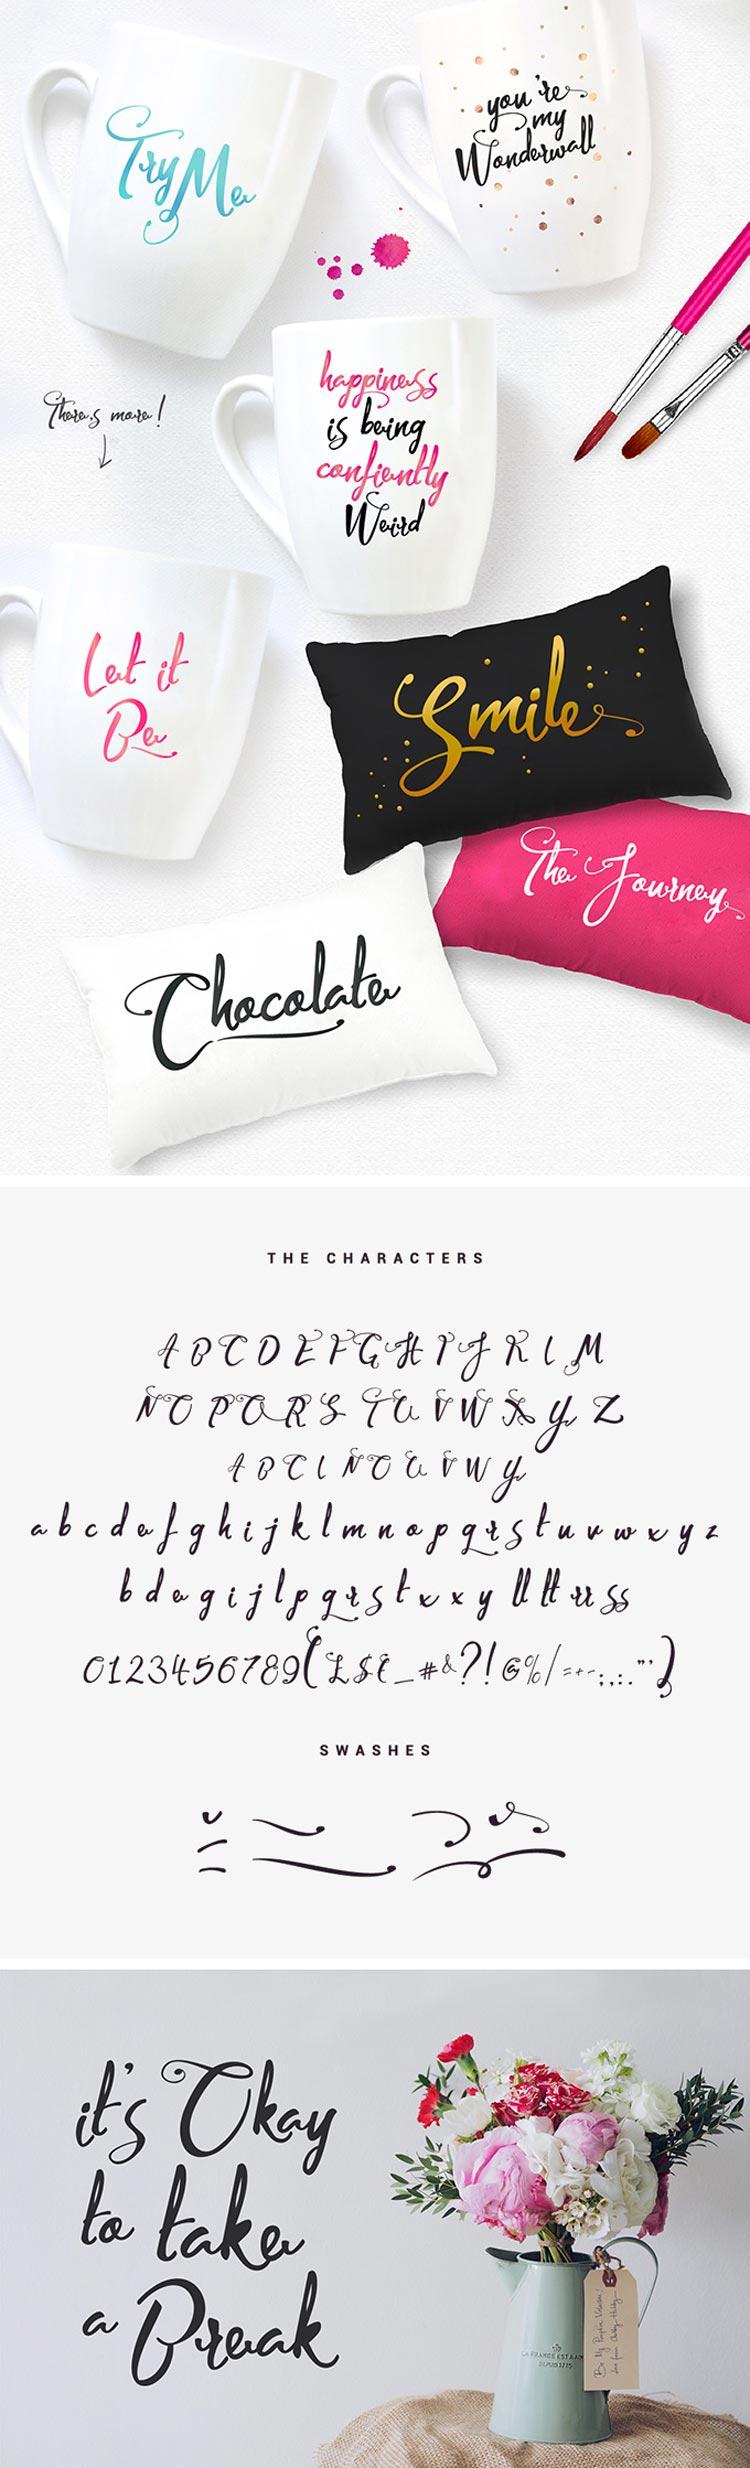 Free font-Awesawez-Blographisme-02